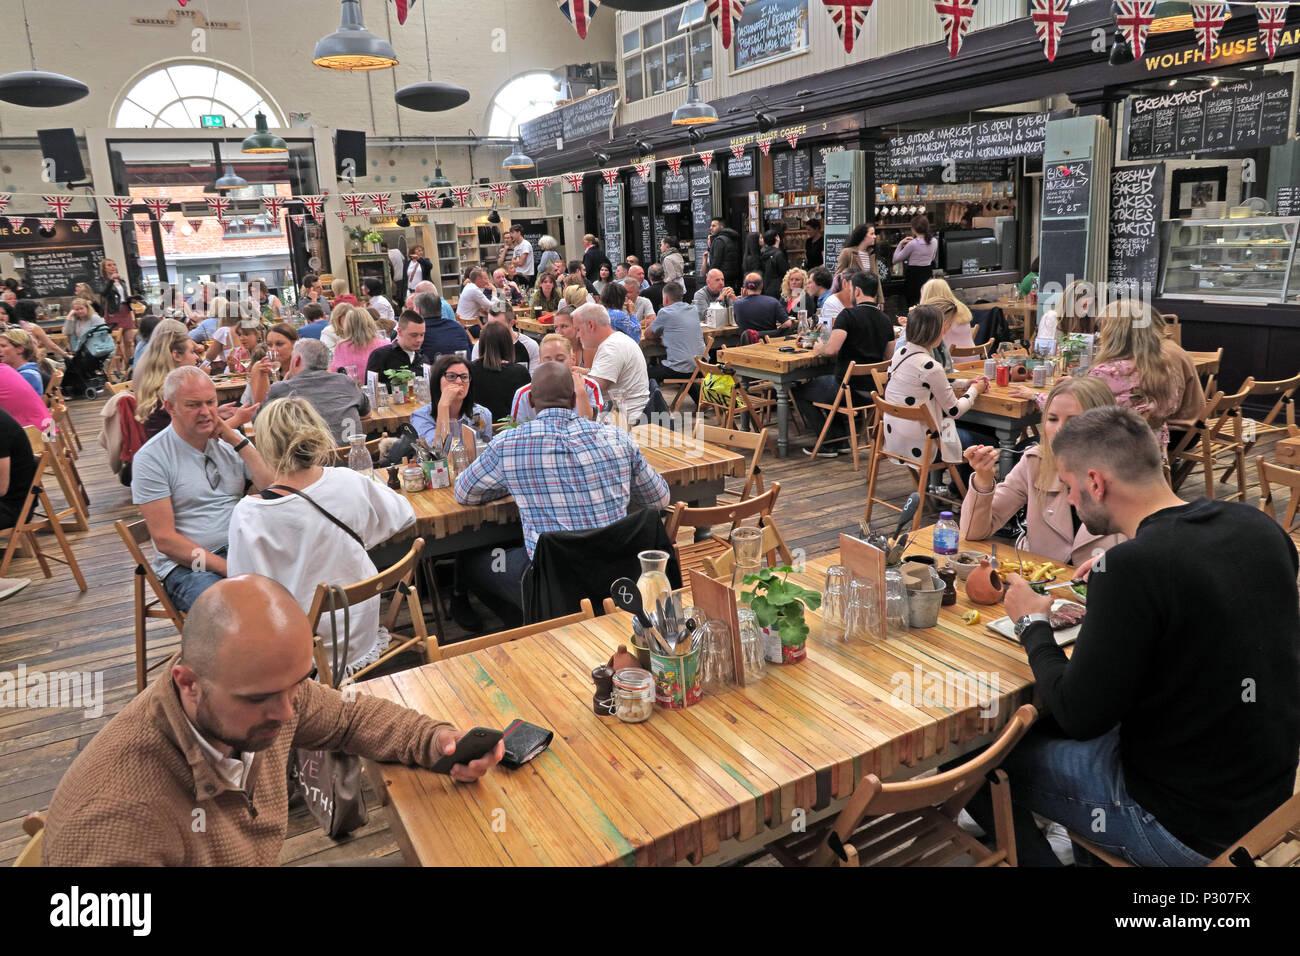 GoTonysmith,@HotpixUK,Trafford,Cheshire,town,centre,shopping,retail,similar